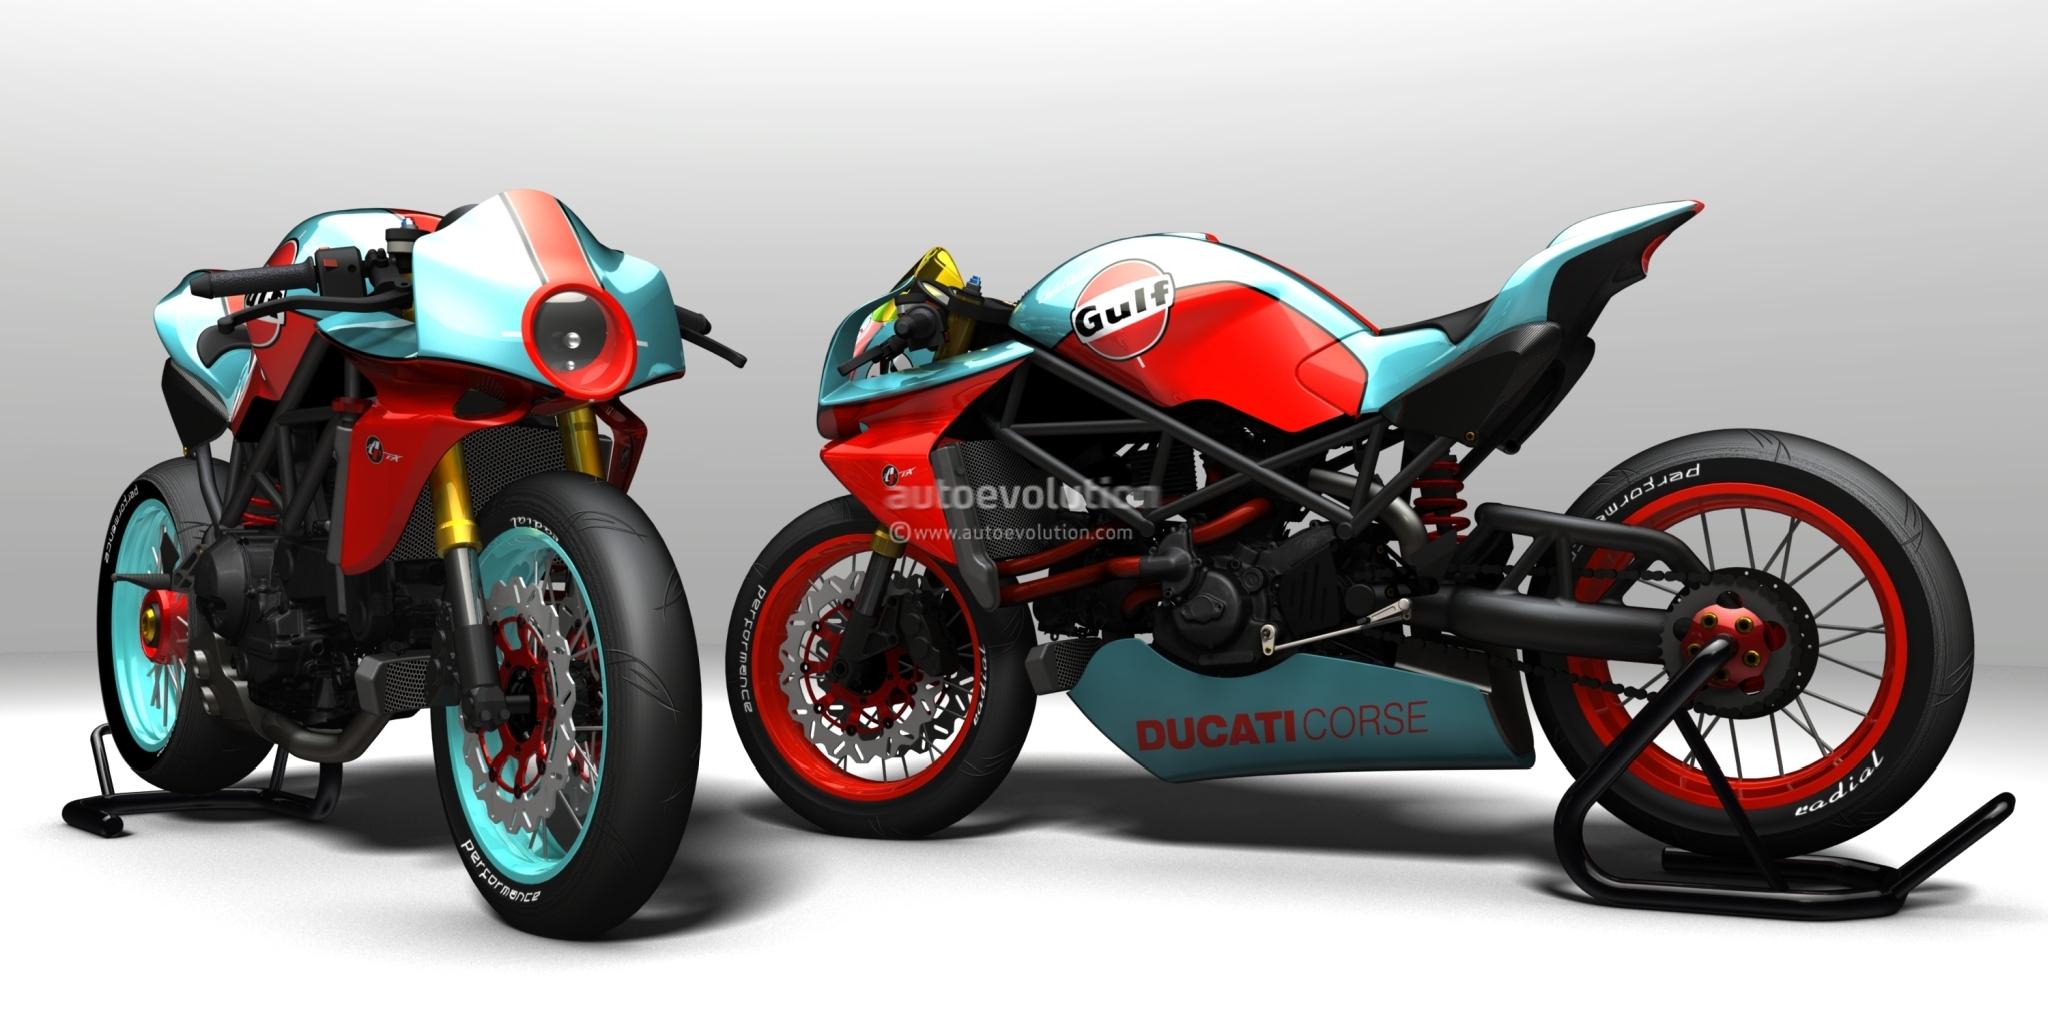 TEX Motorbike / Paolo Tesio on Instagram: Ducati SC-8NERO